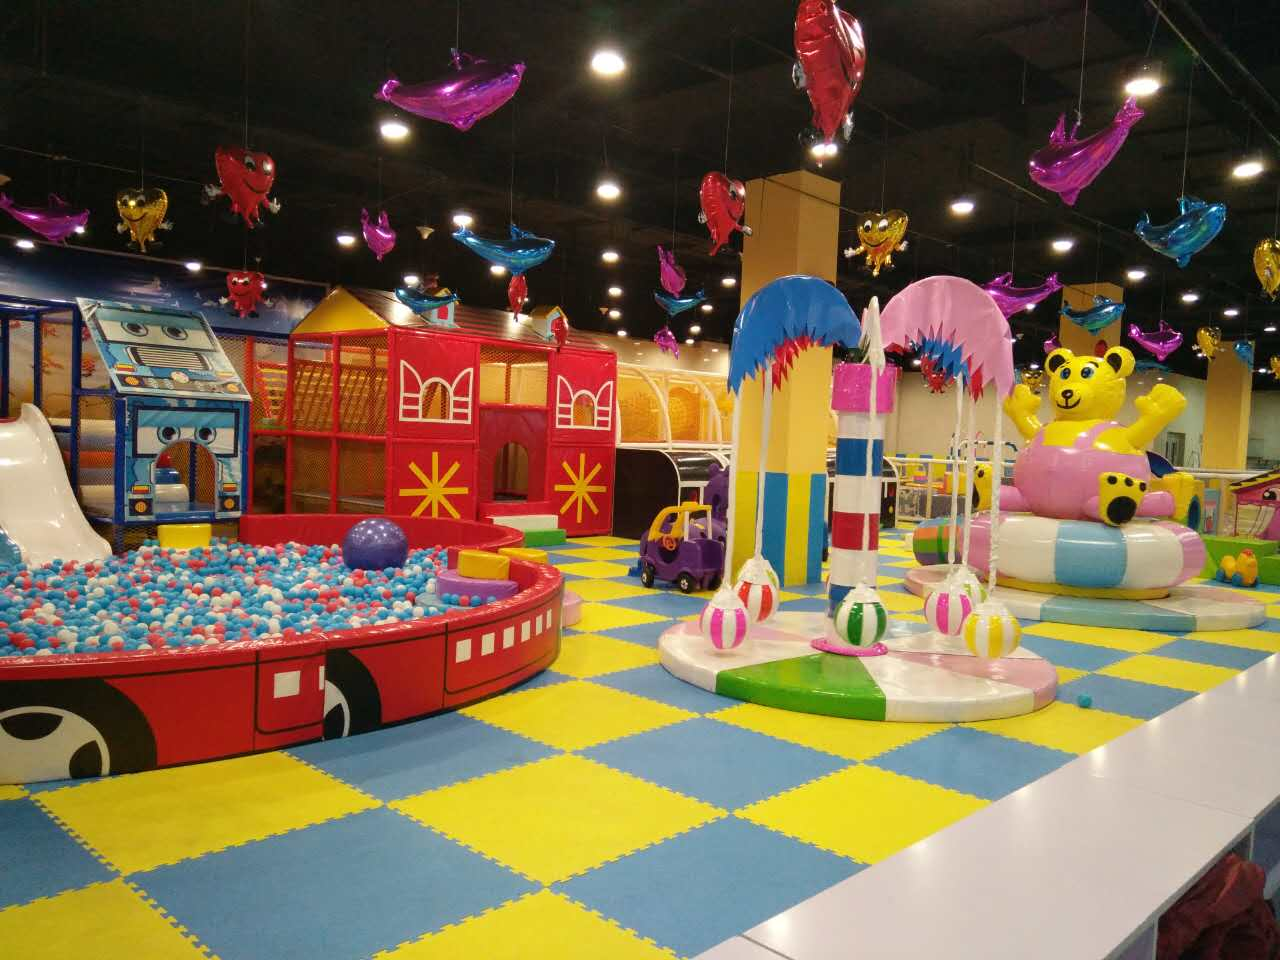 QQ图片20170209161540.jpg 天水儿童乐园合作加盟 加盟资讯 游乐设备第3张